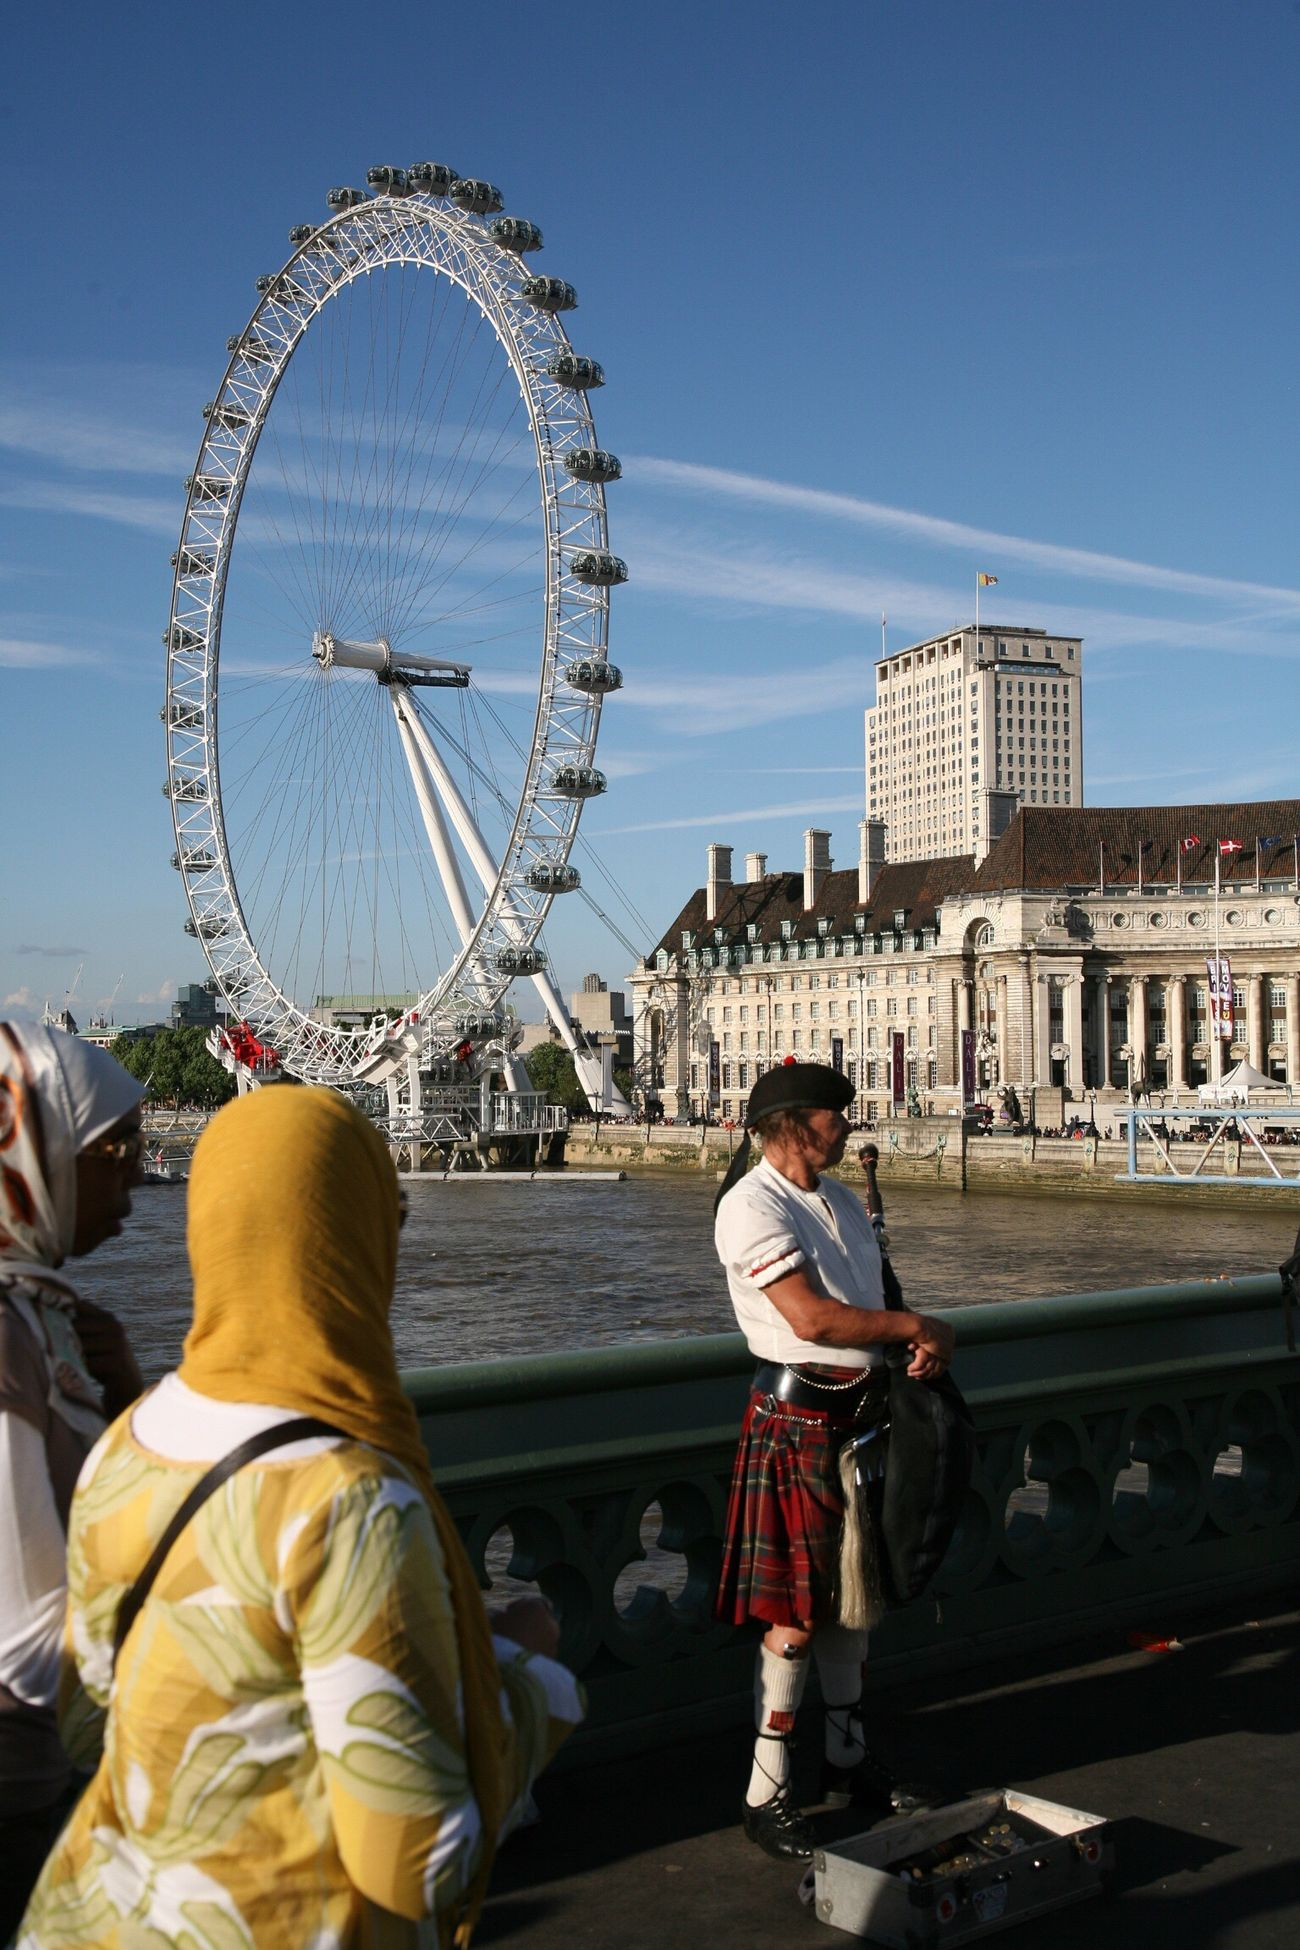 London Lifestyle Architecture Ferris Wheel Tourist City Sunlight Outdoors Leisure Activity Traditional Clothing London Eye